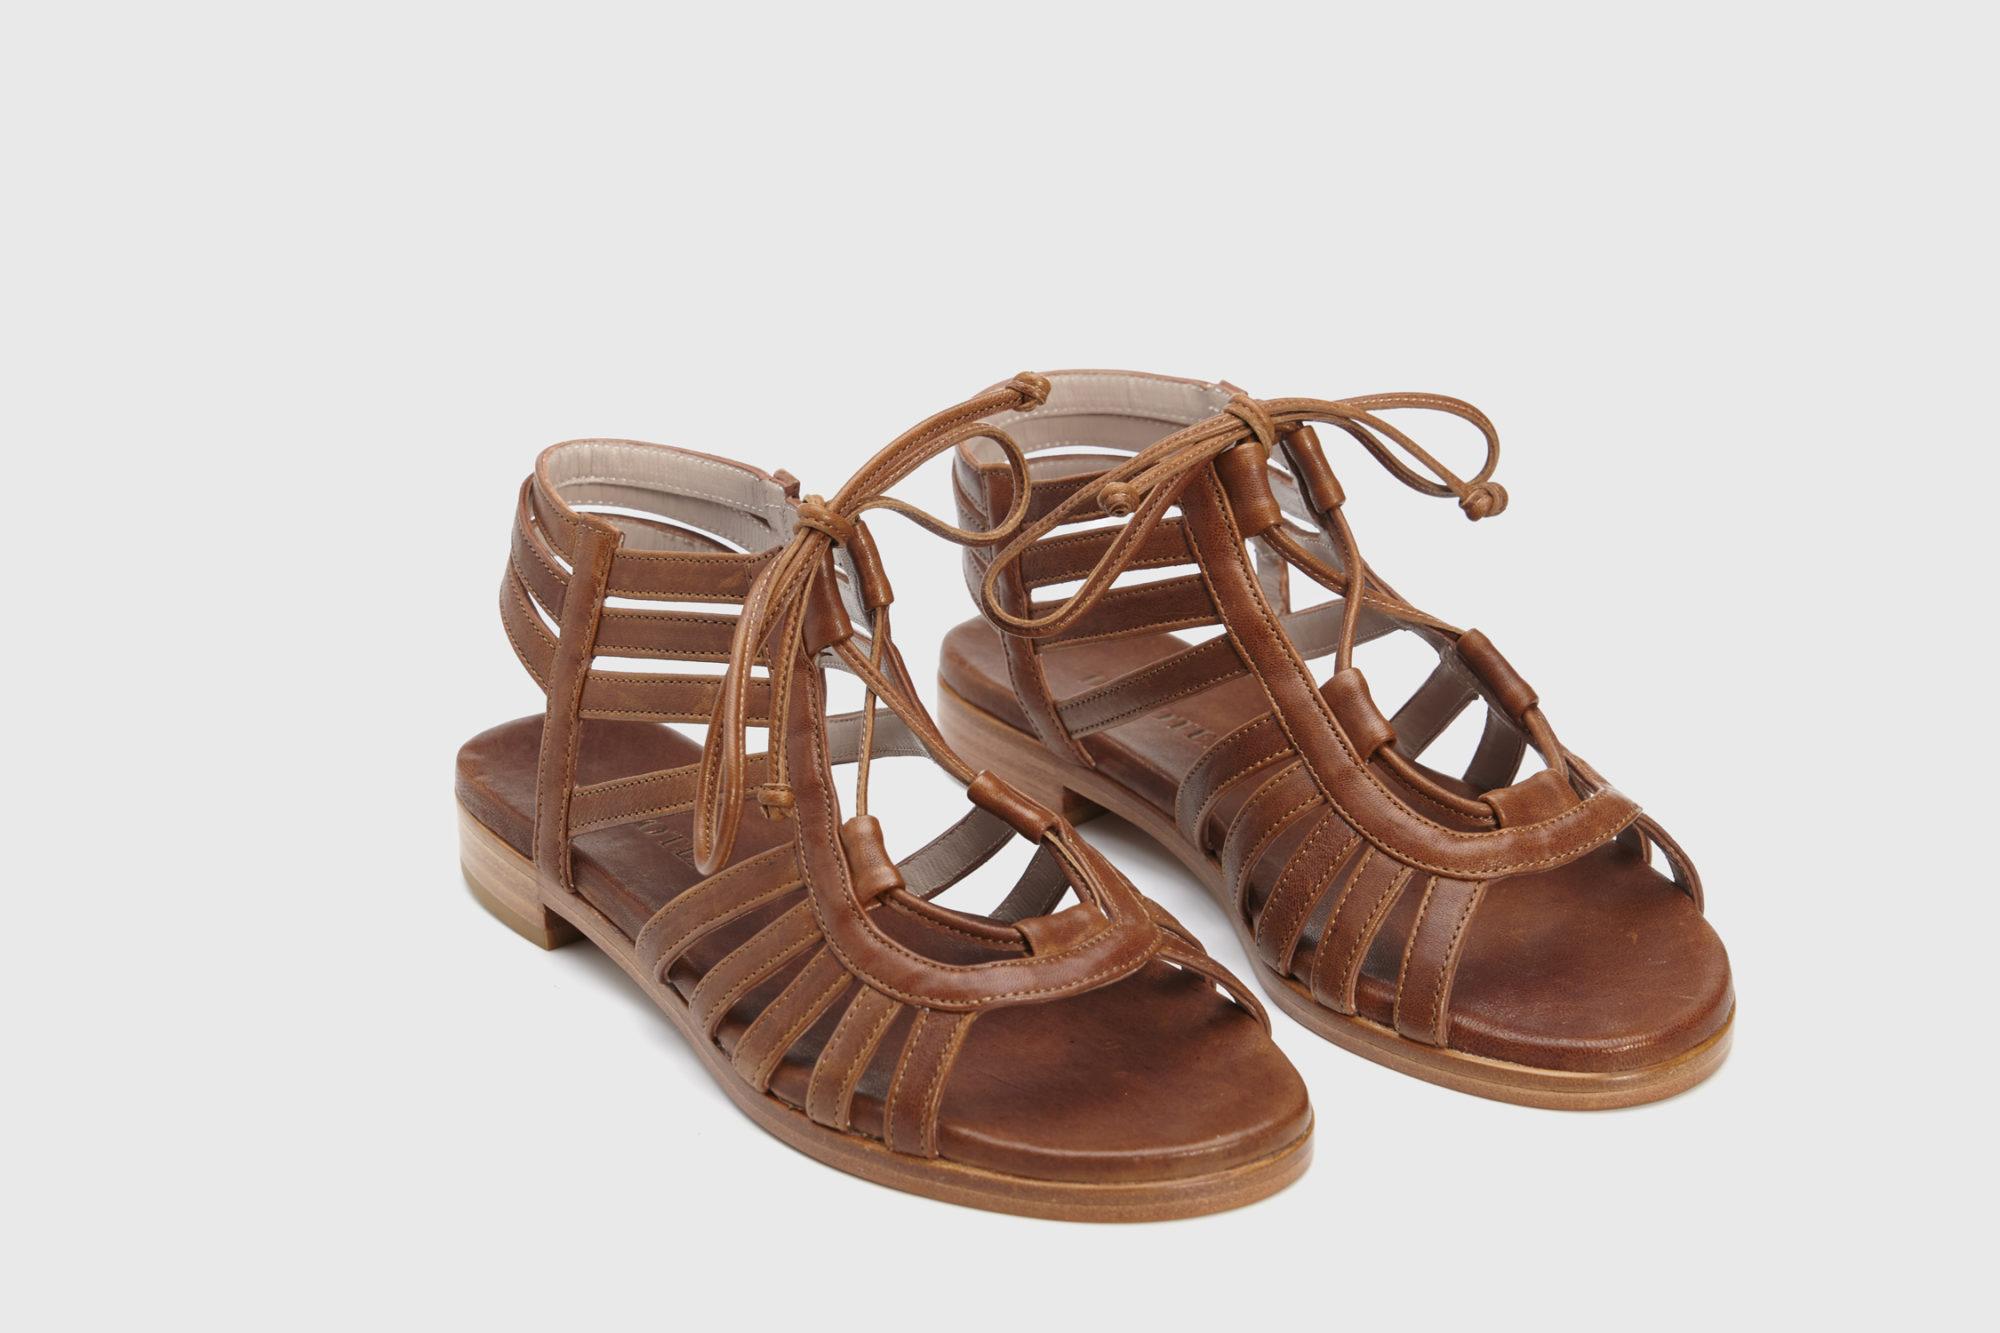 Dorotea sandalia plana Margot cuero ss18 par